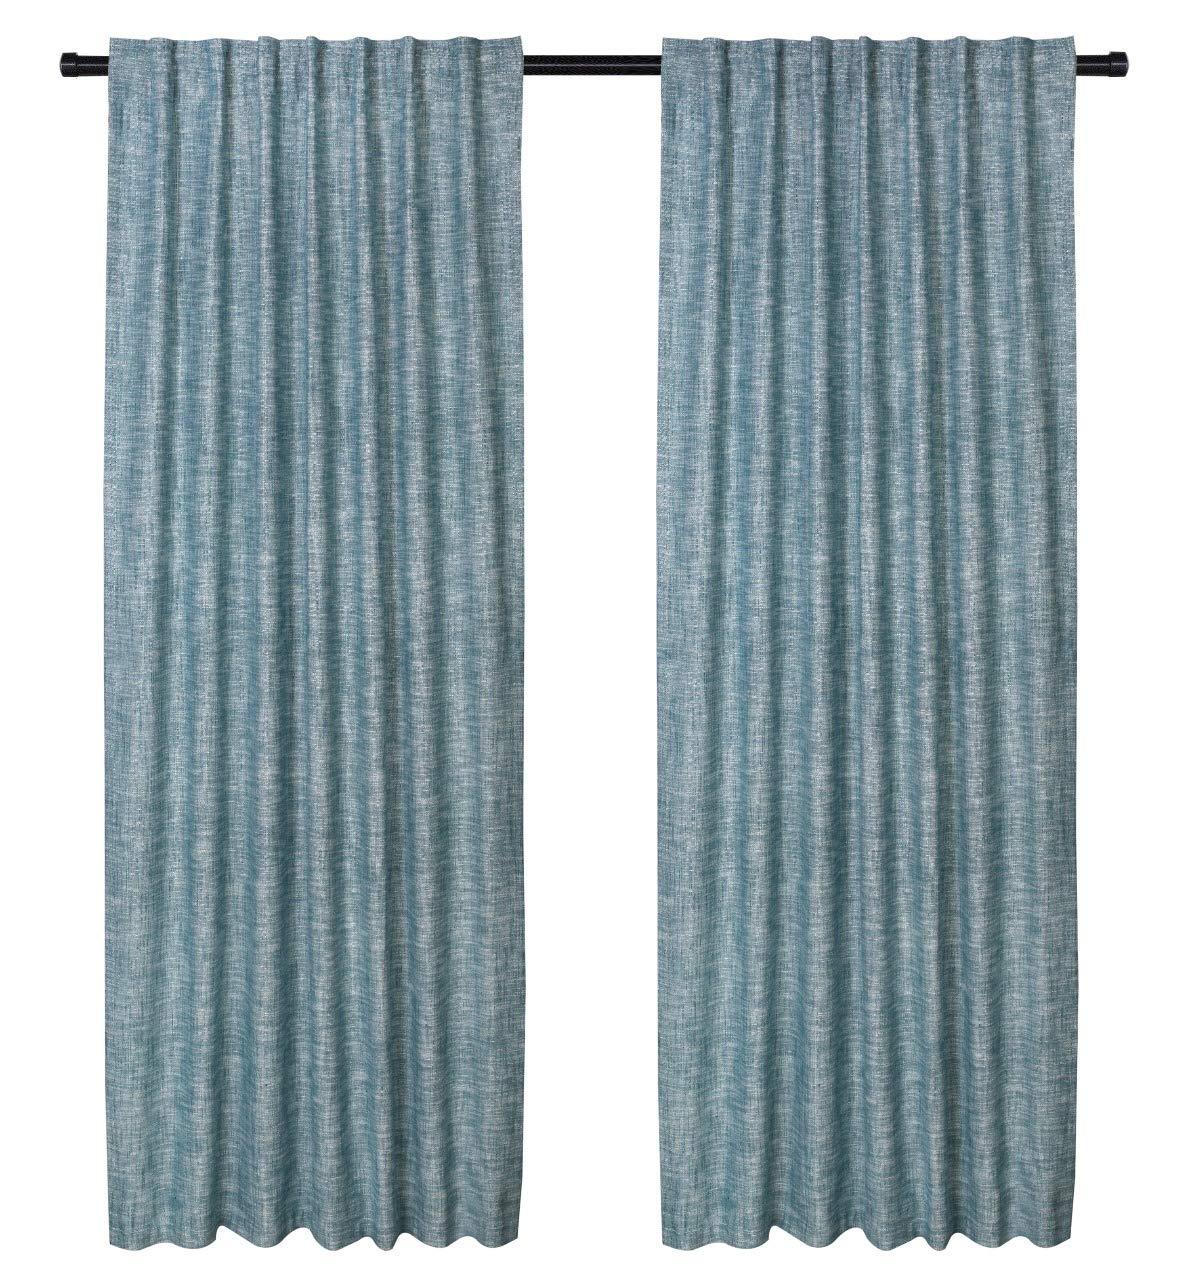 Farmhouse Style Bedroom Curtains - Arm Designs on Farmhouse Bedroom Curtain Ideas  id=45258